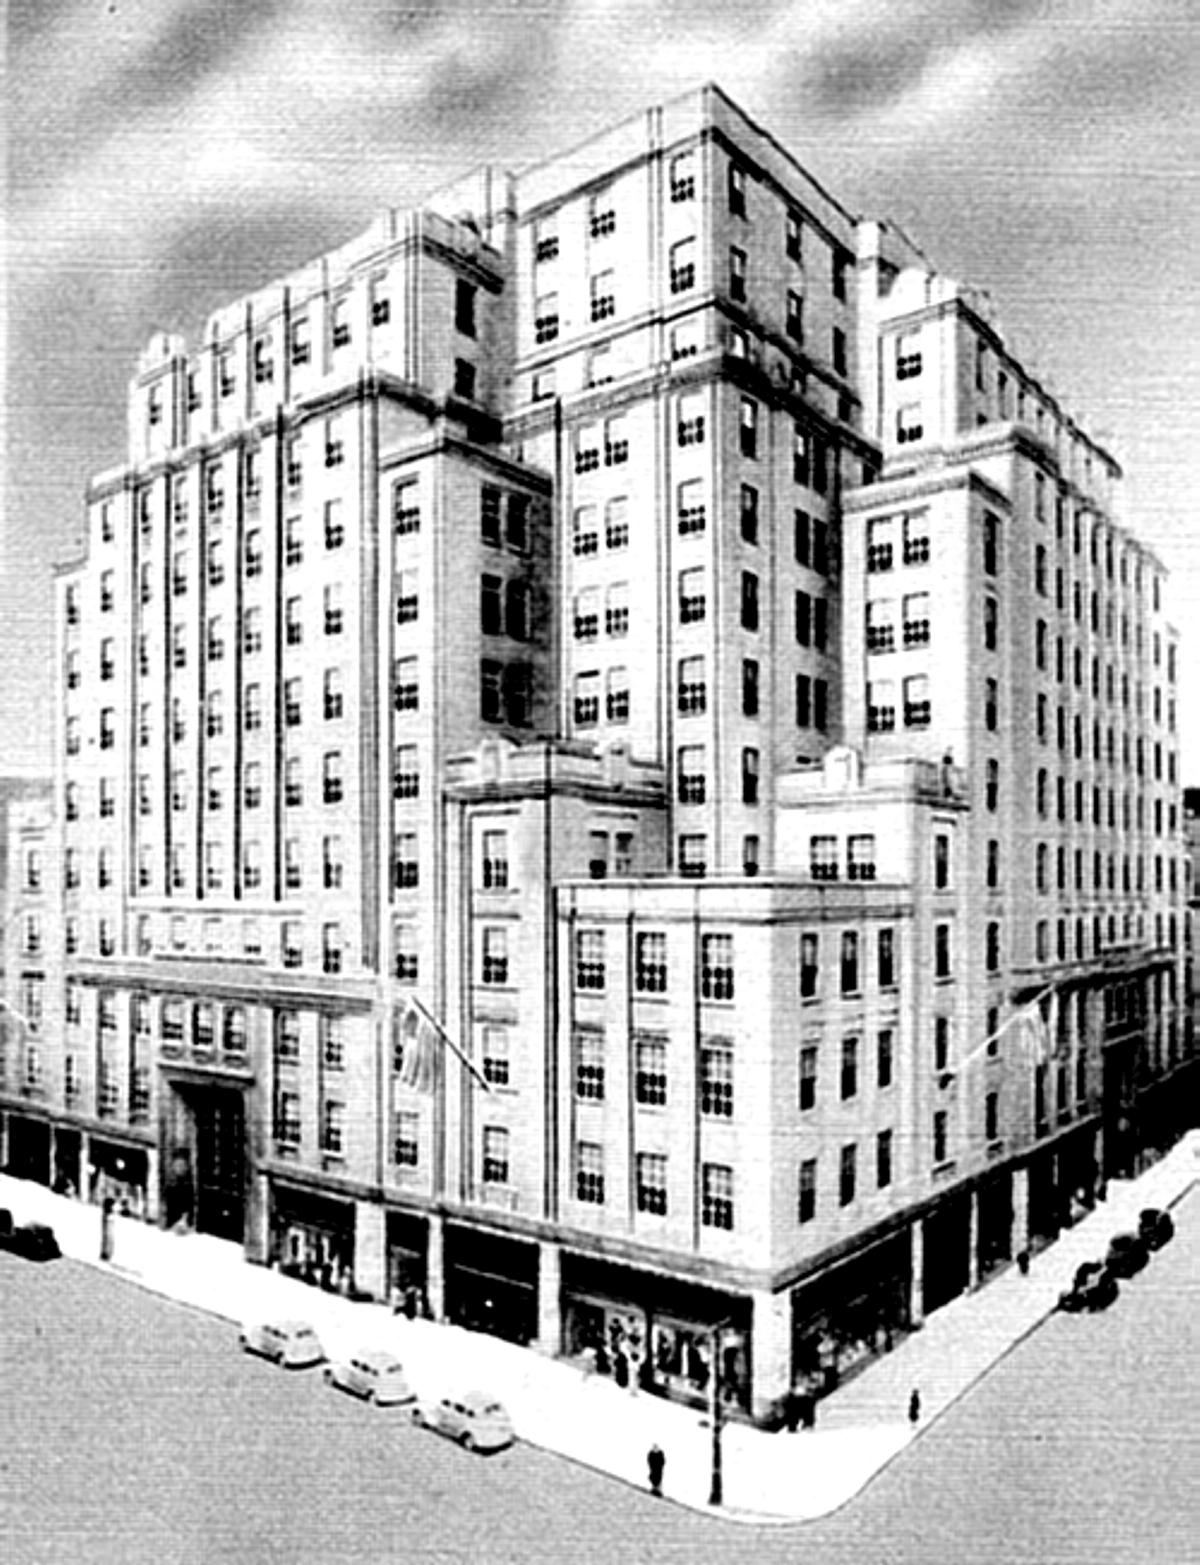 the department store museum strawbridge clothier philadelphia the modern building of strawbridge clothier built between 1928 and 1932